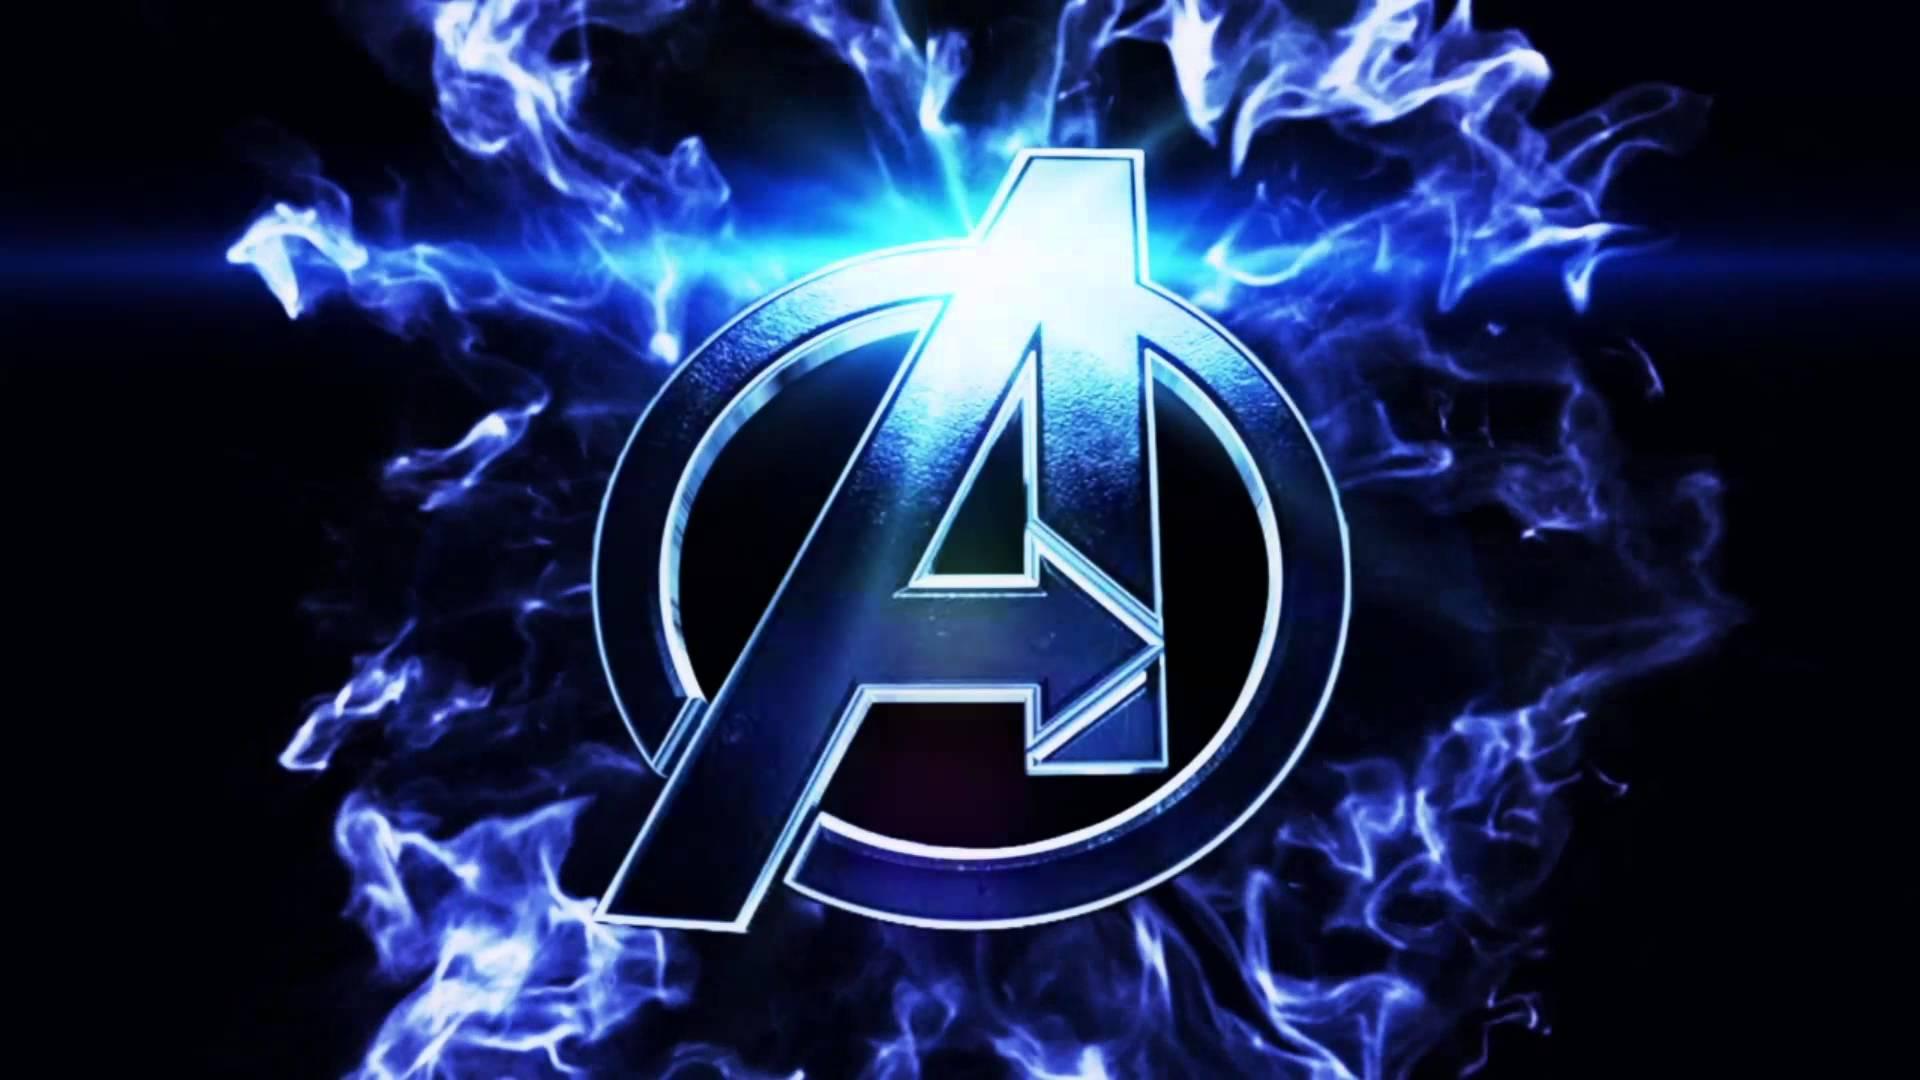 Avengers symbol wallpapers wallpaper cave - Avengers symbol wallpaper ...